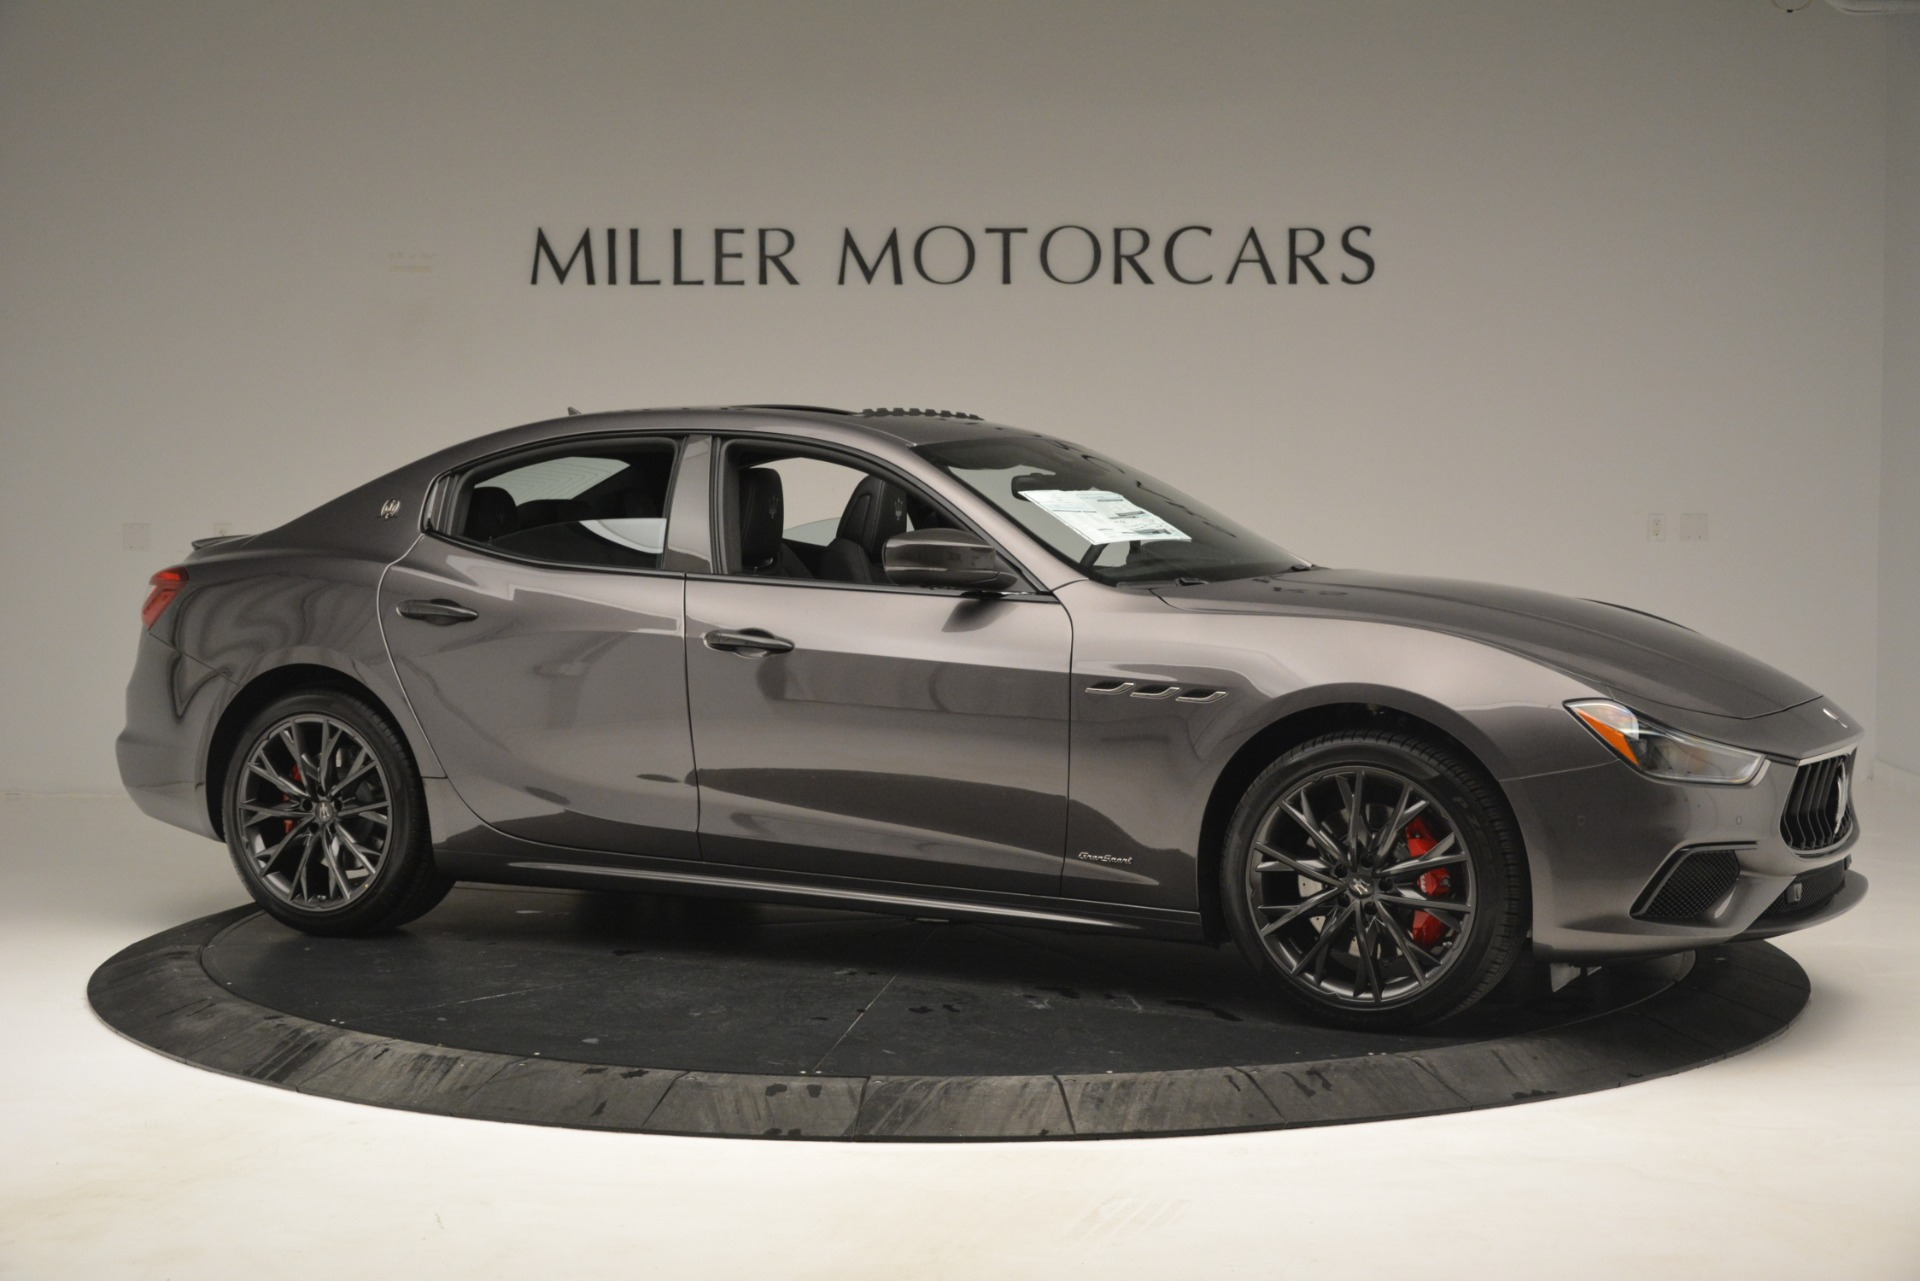 New 2019 Maserati Ghibli S Q4 GranSport For Sale In Greenwich, CT 2925_p11